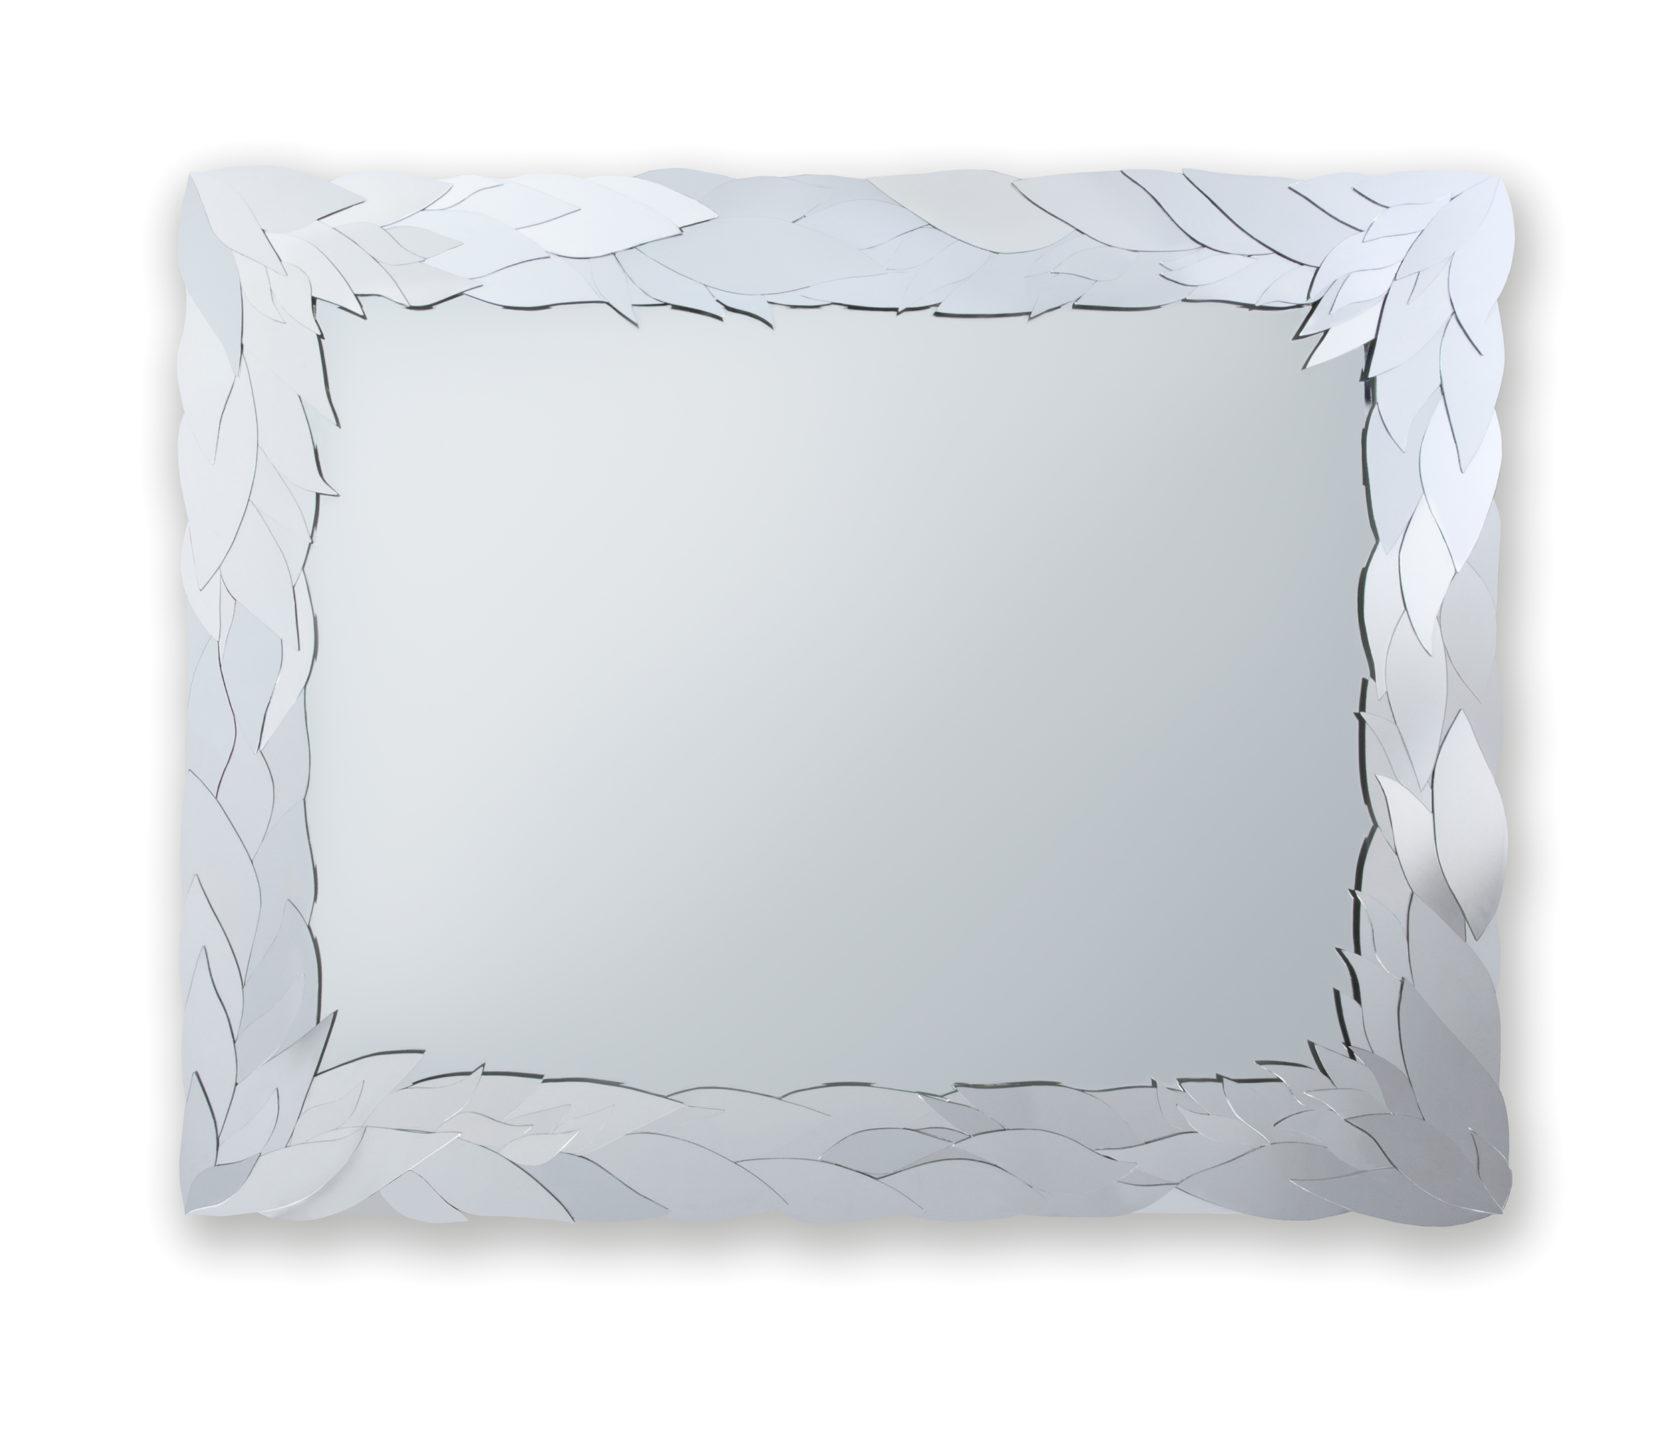 LOTUS-mirror-2-nicole-fuller-product-information